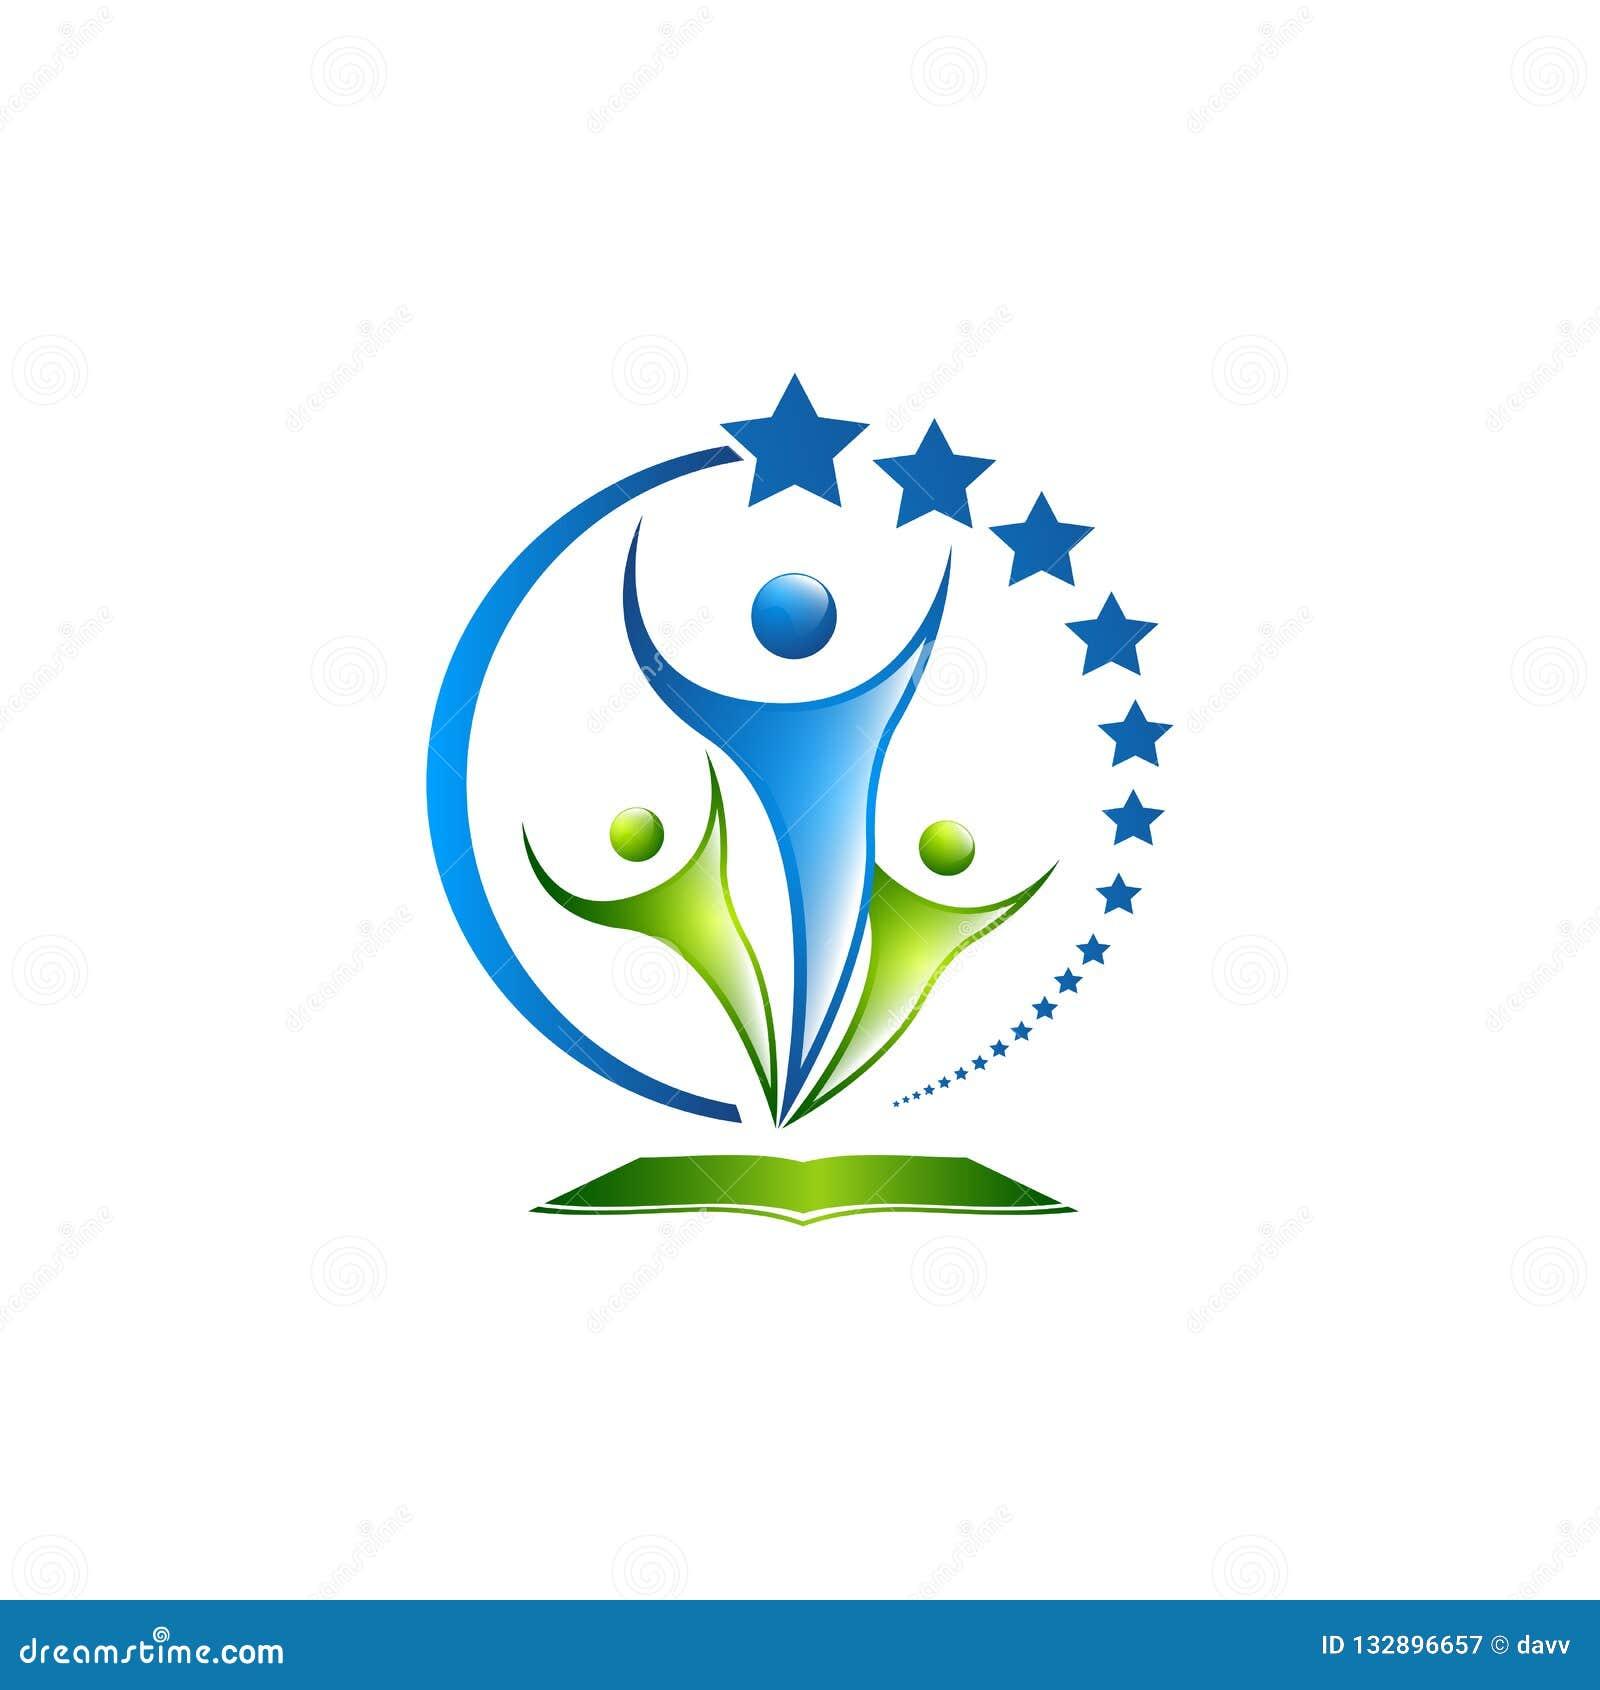 vector 3d men, human, people logo of 4. meeting, family, all tog stock  vector - illustration of partnership, management: 132896657  dreamstime.com